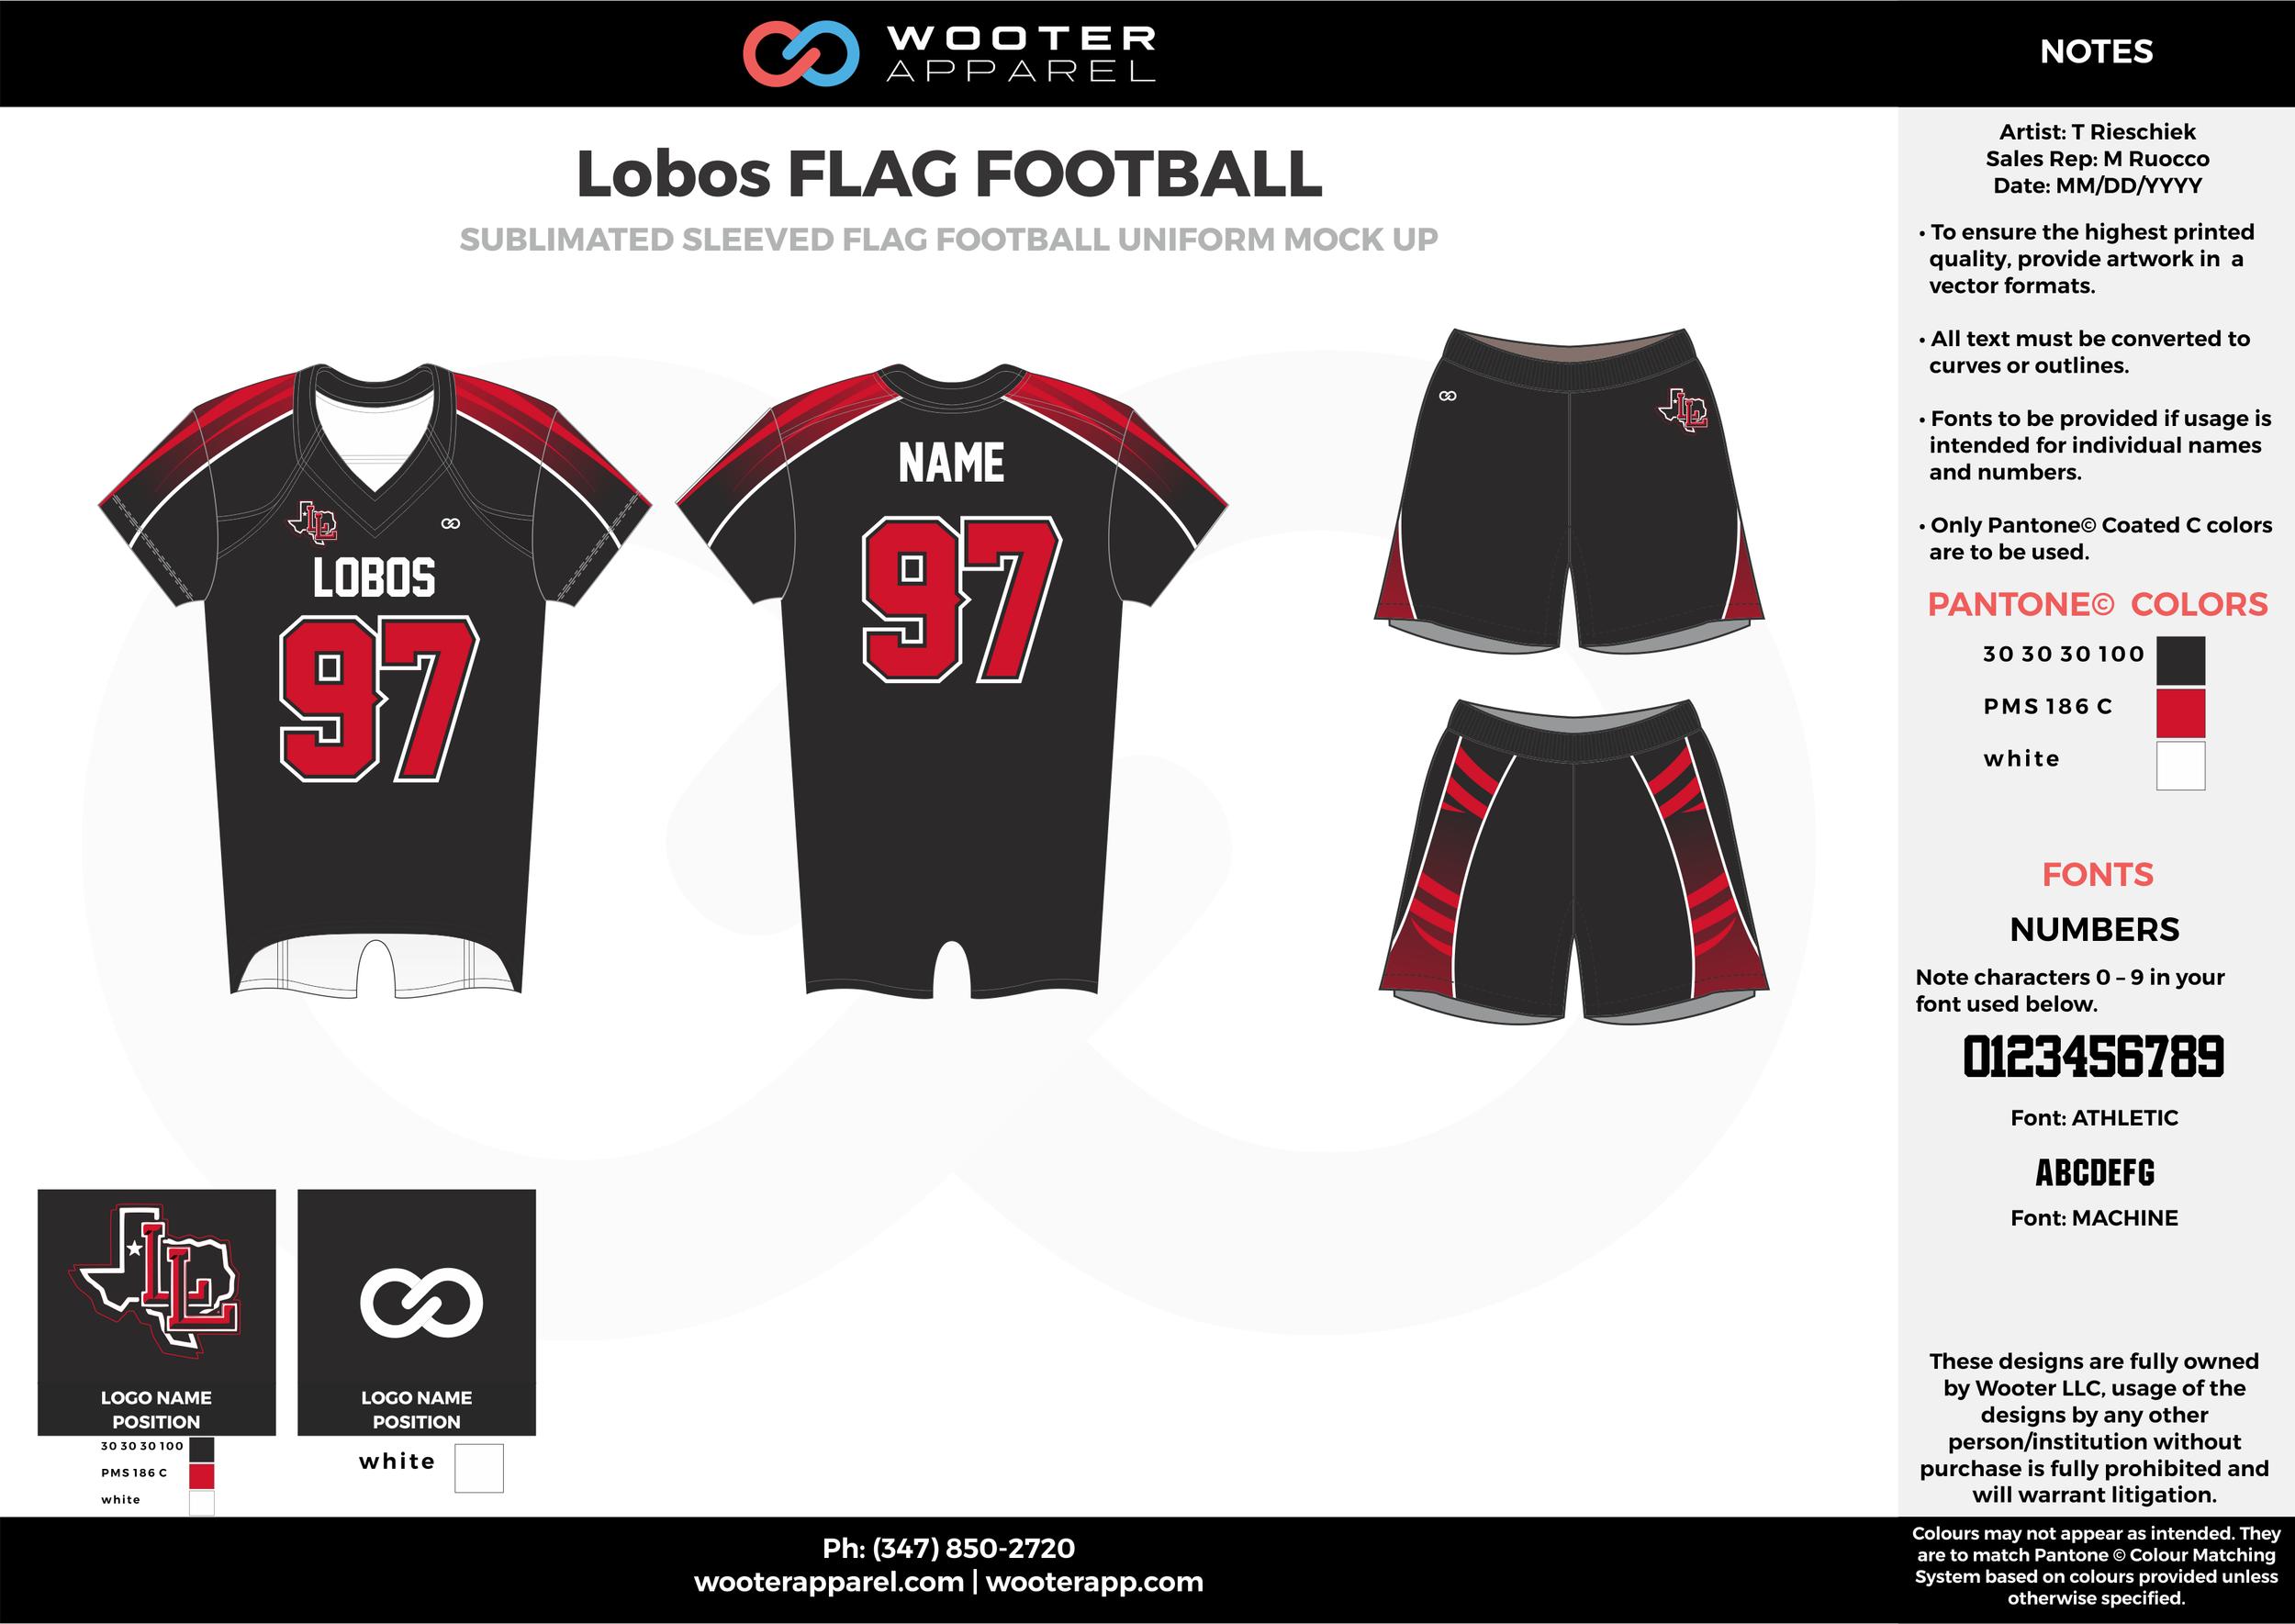 LOBOS FLAG FOOTBALL red white black football uniforms jerseys shorts